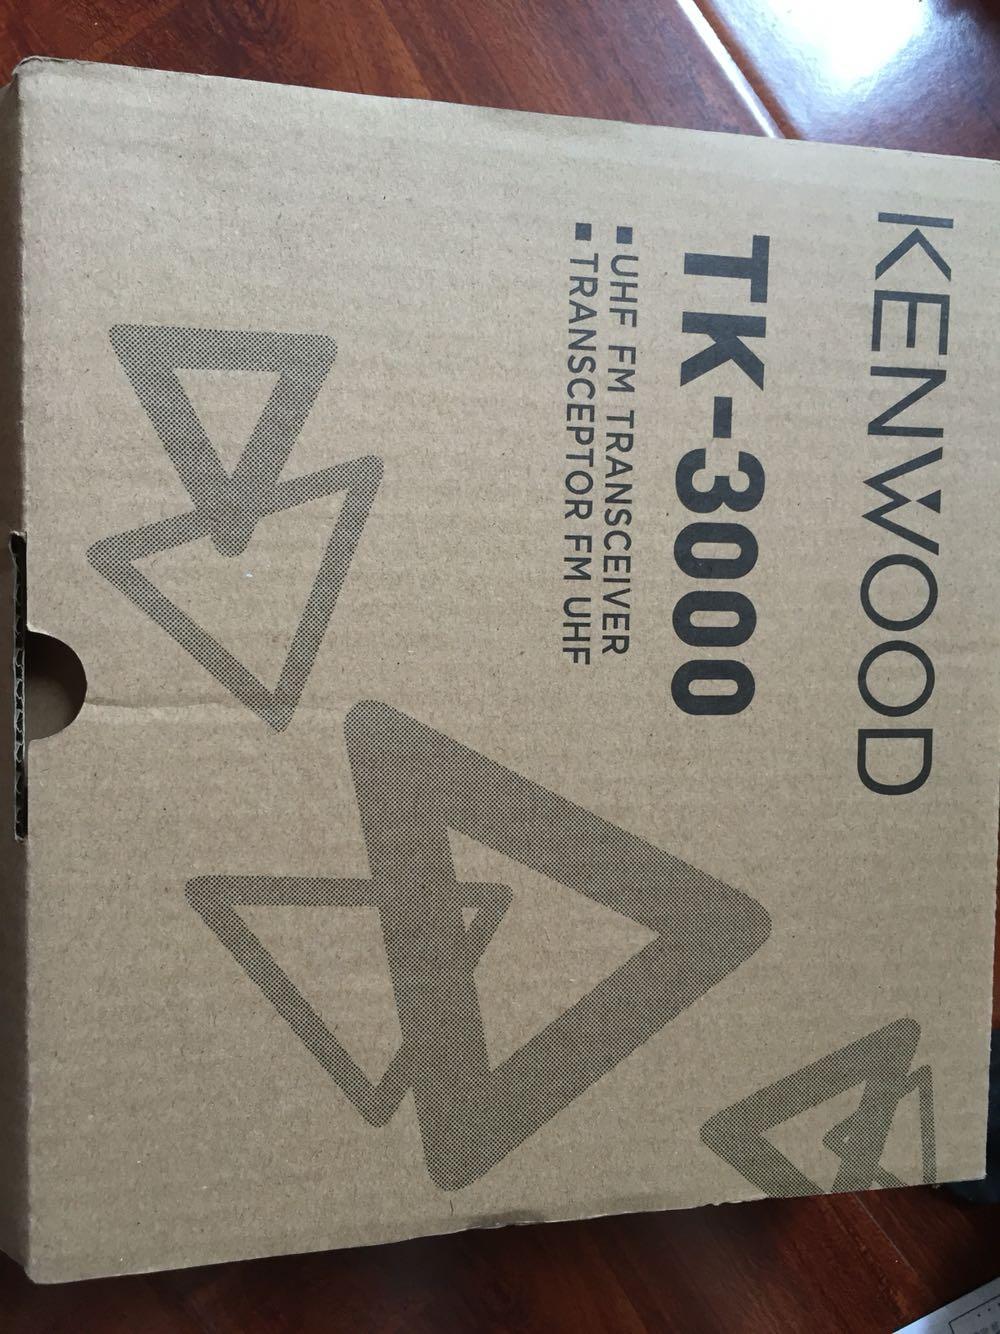 Kenwood TK-3000 UHF Two-way Radio